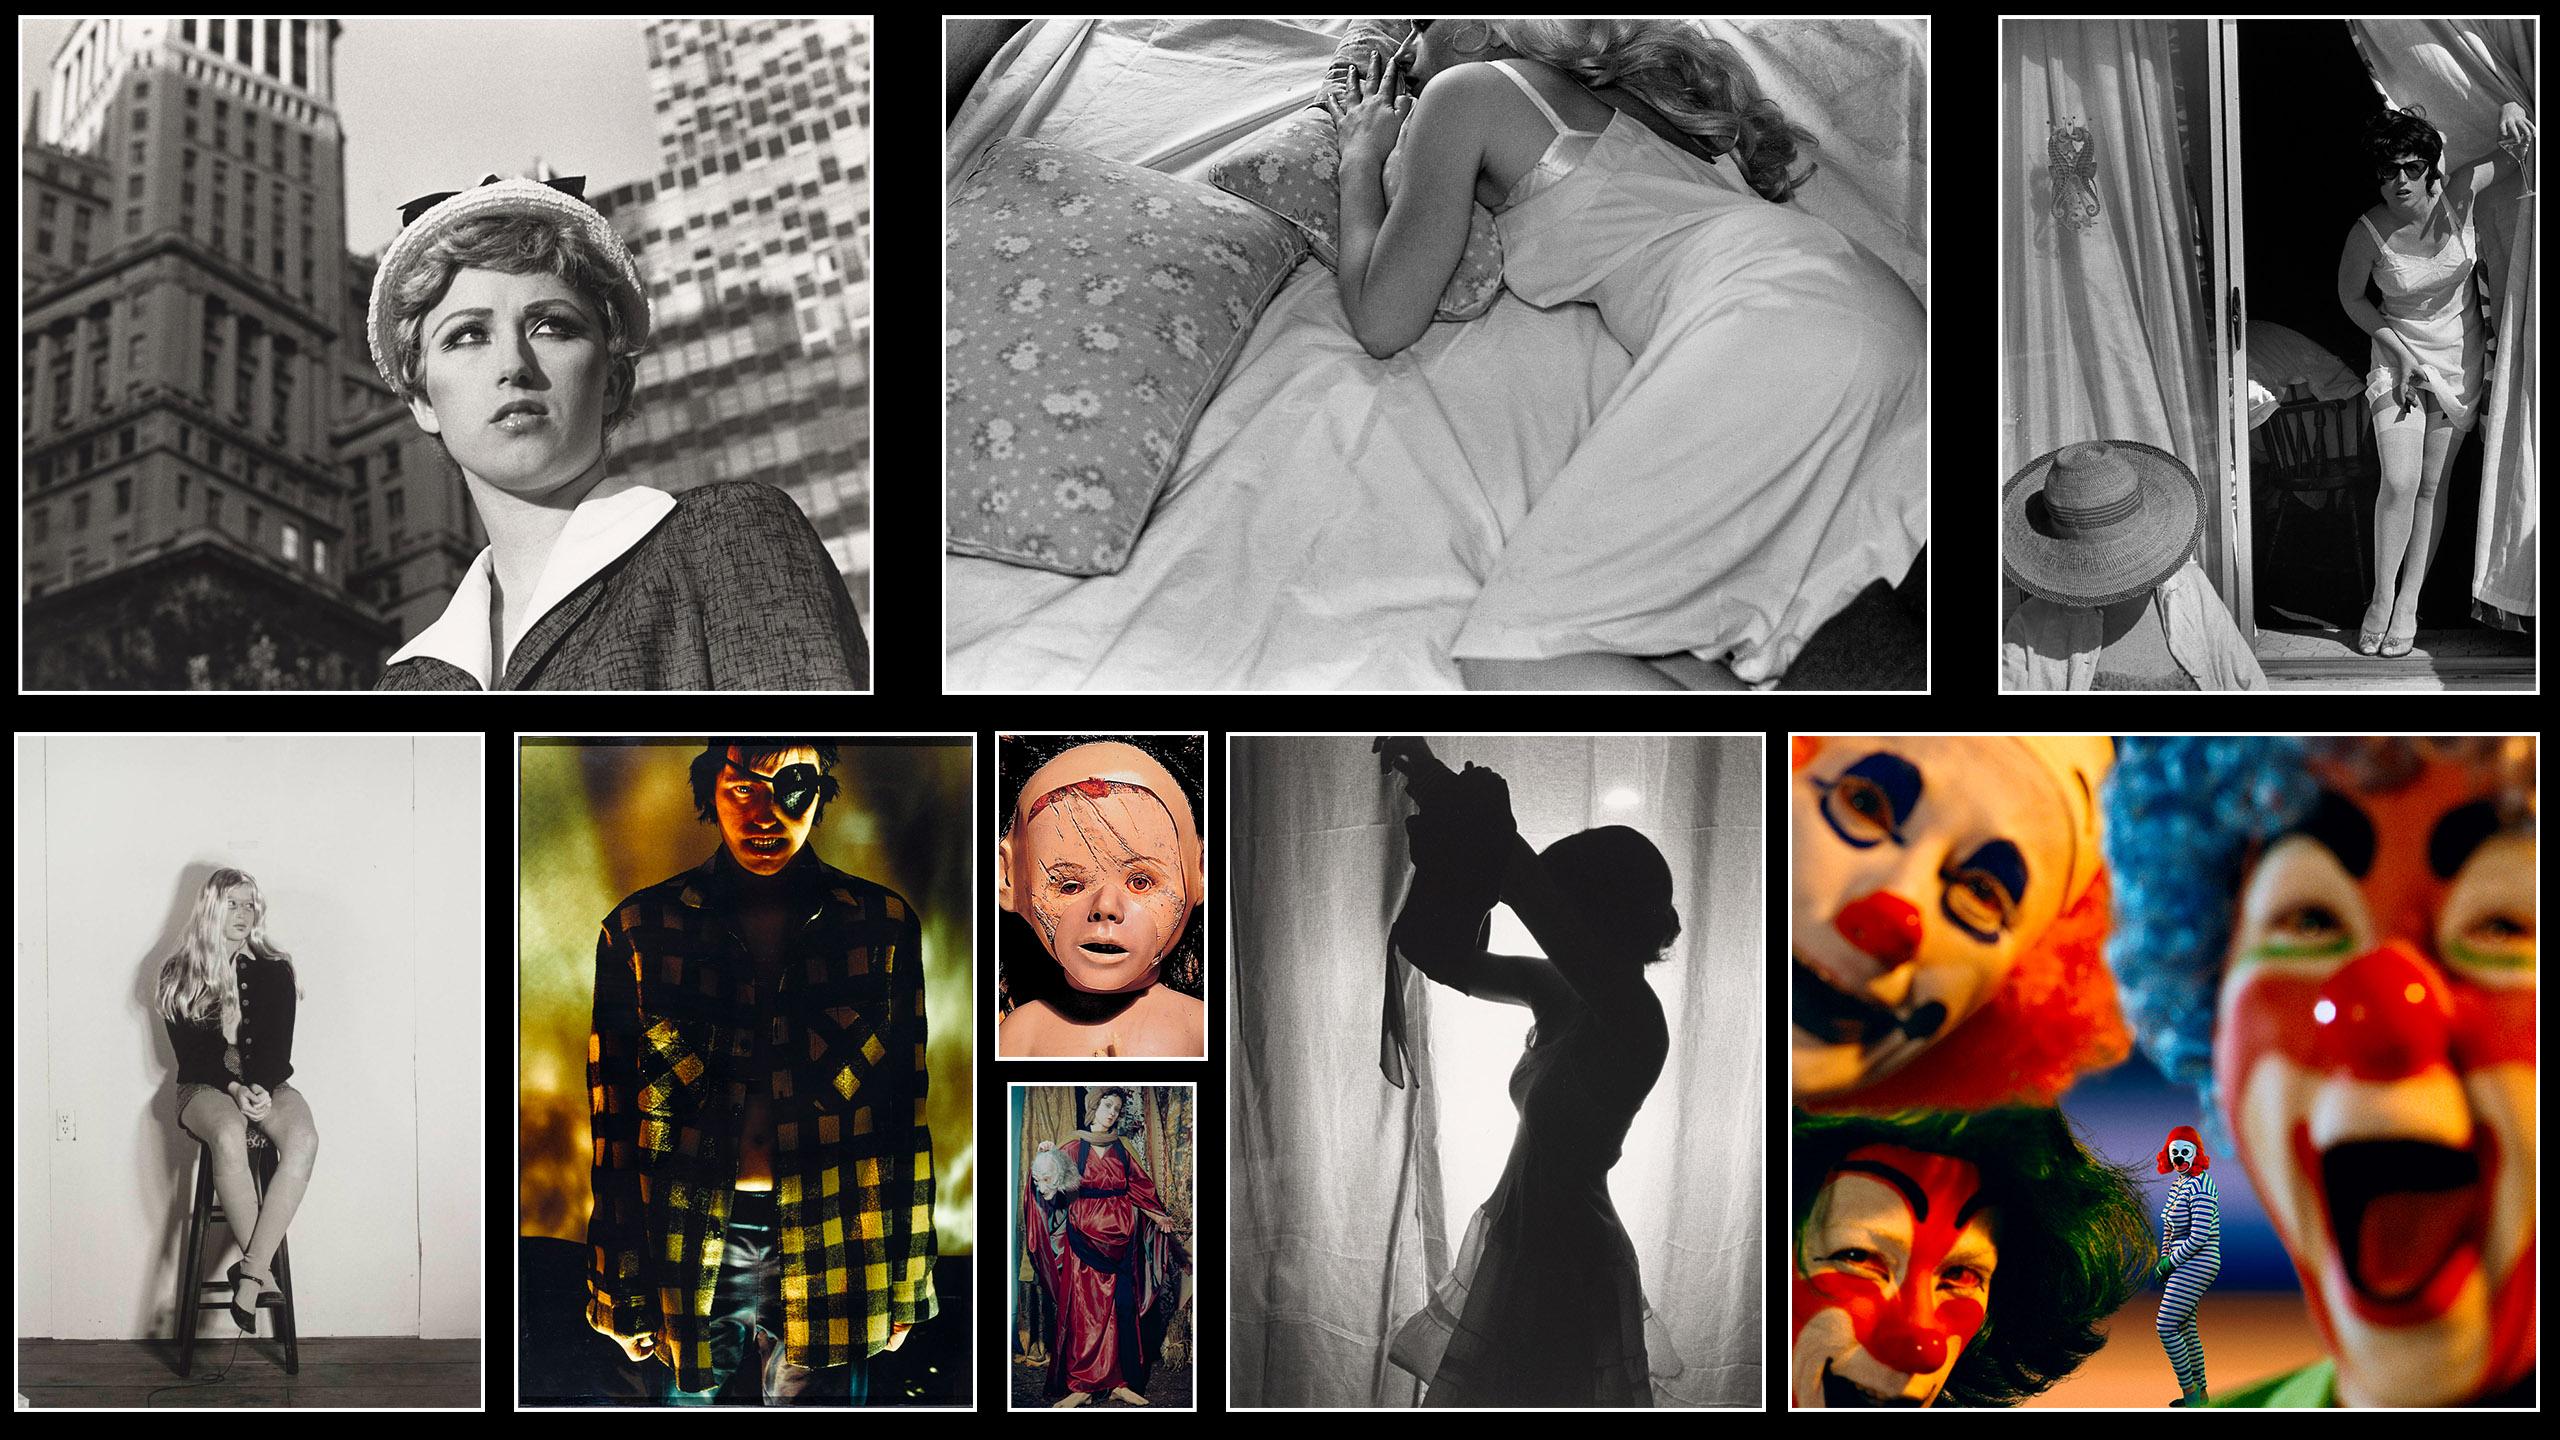 On Photography February 16, 2020 Cindy Sherman